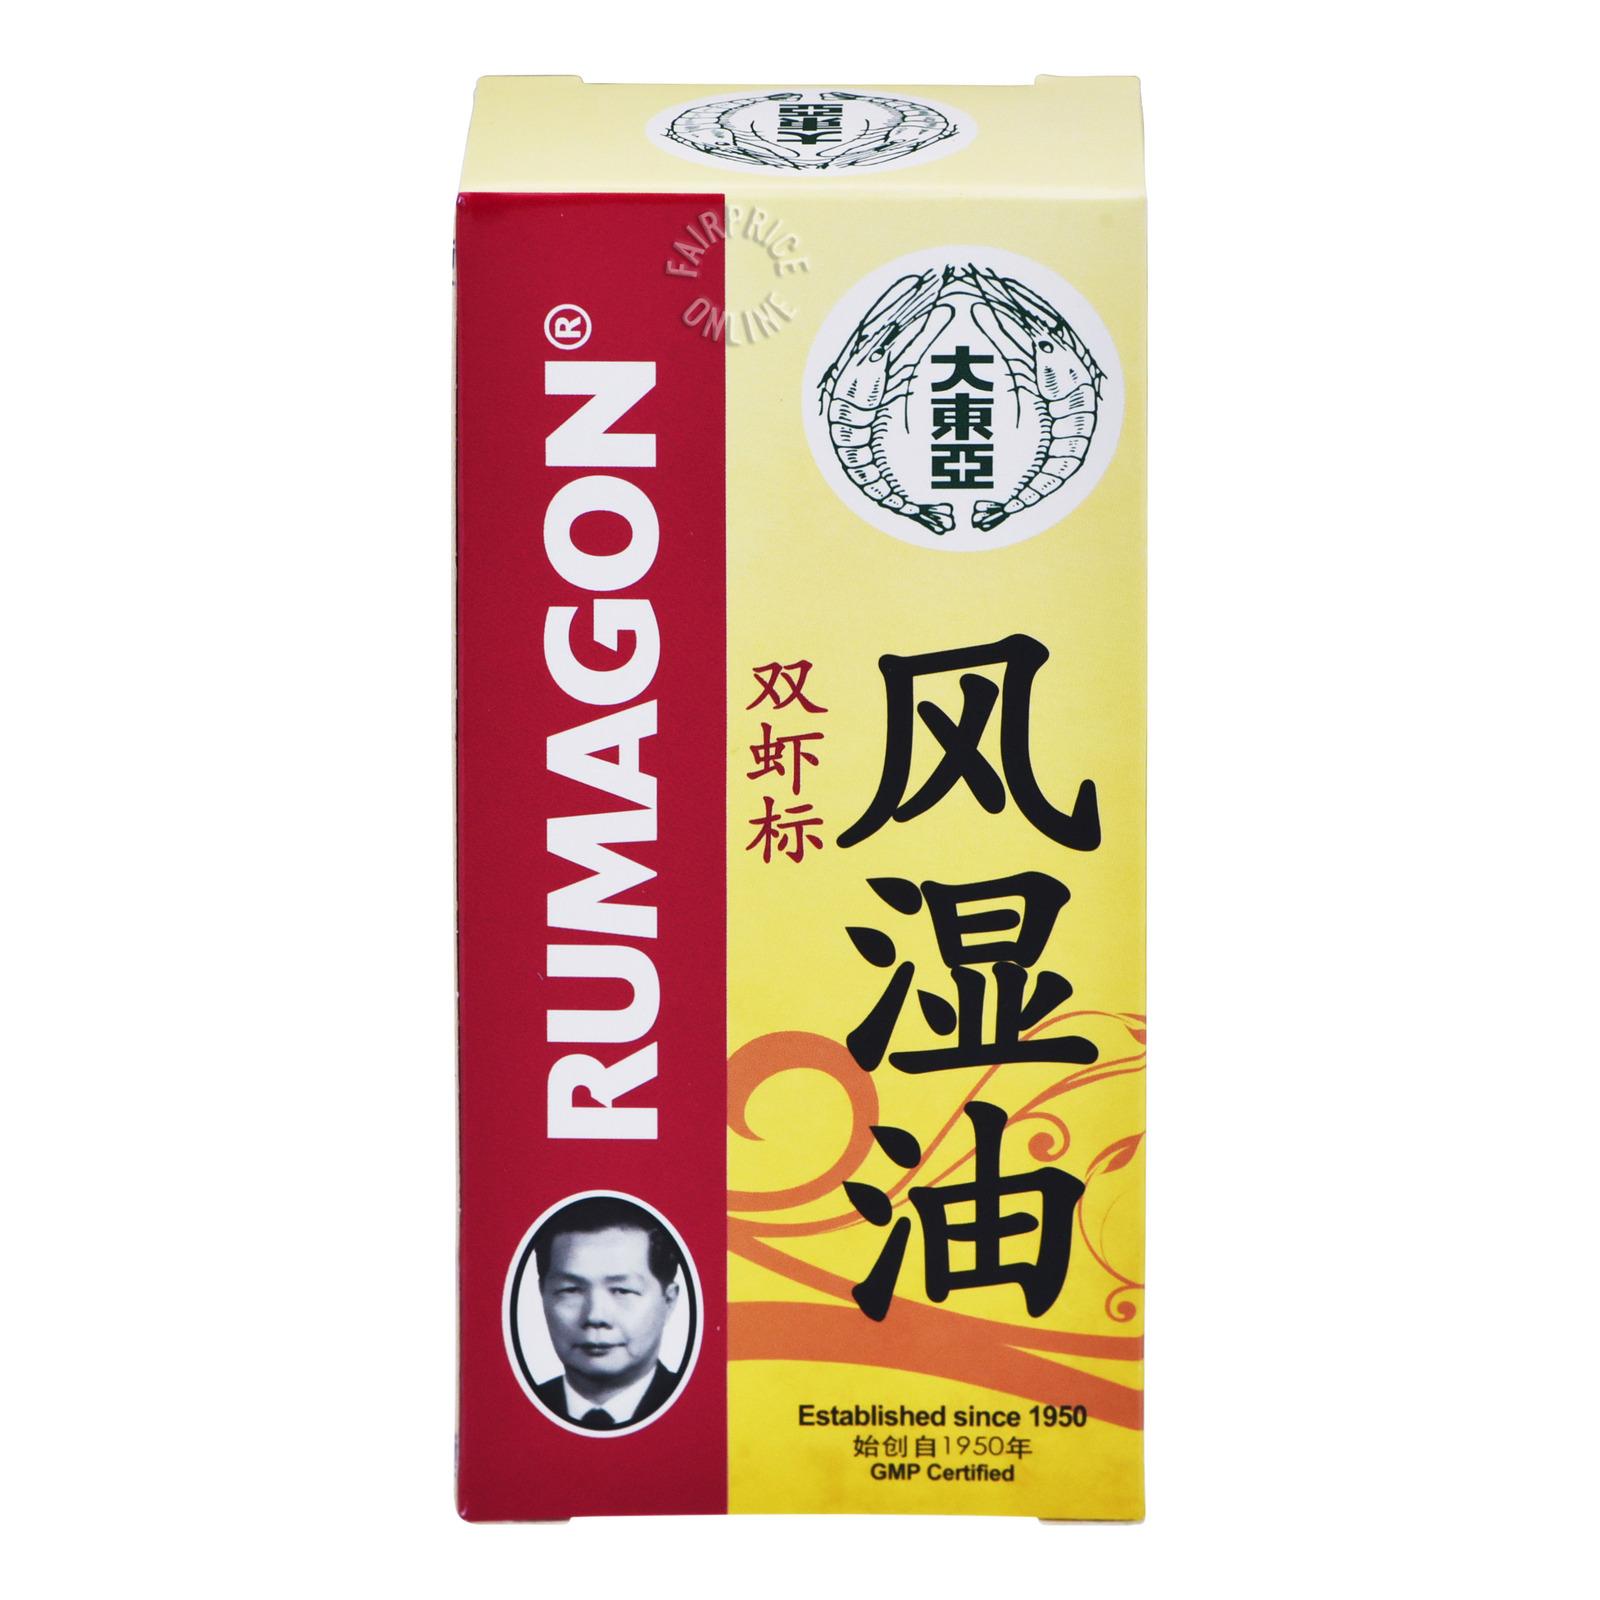 Double Prawn Rumagon Liniment